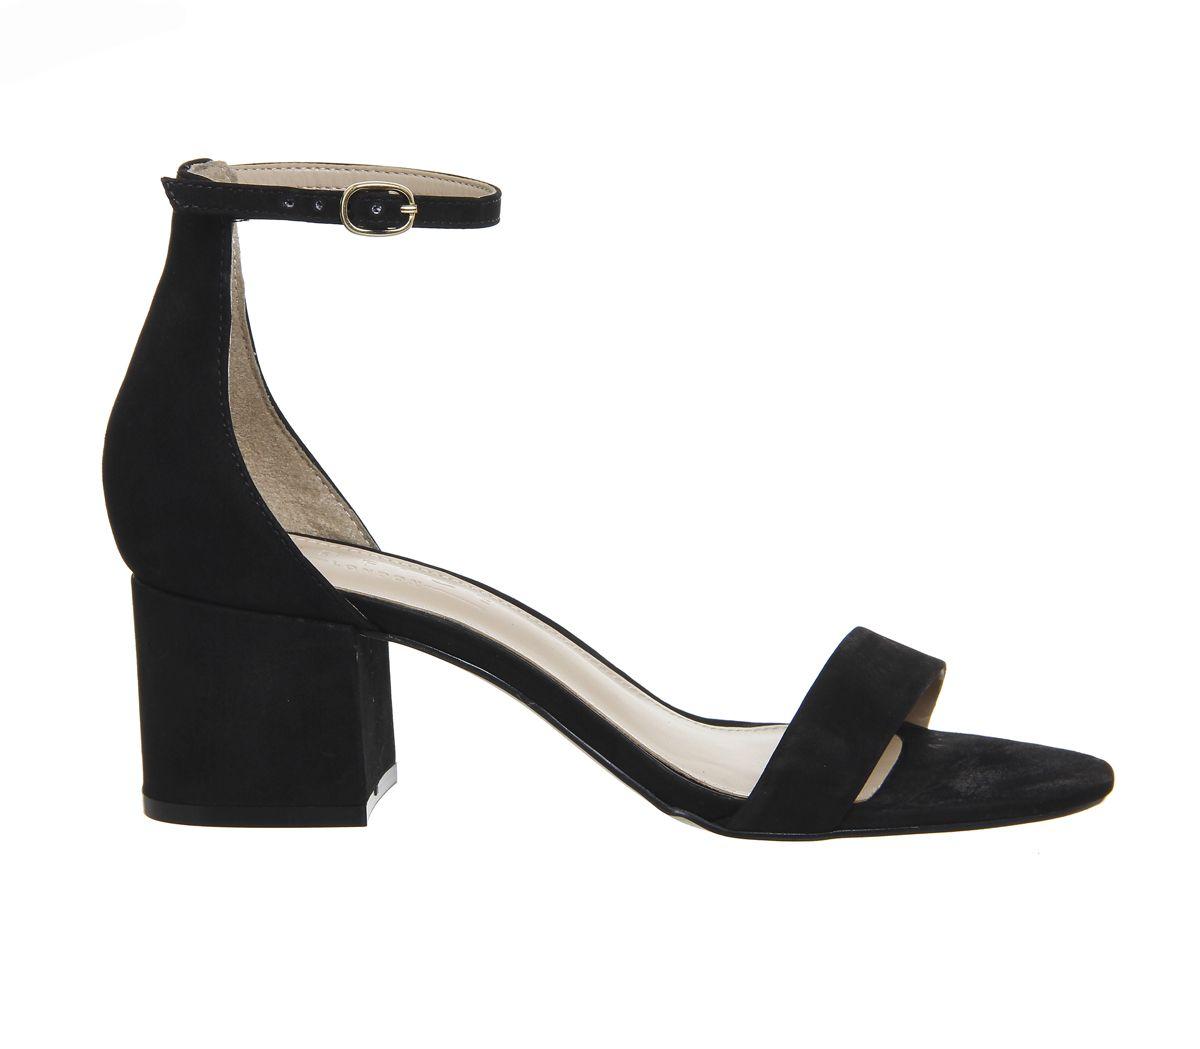 e9808a1fcee Office Finley Block Heel Sandals Black Nubuck - Mid Heels